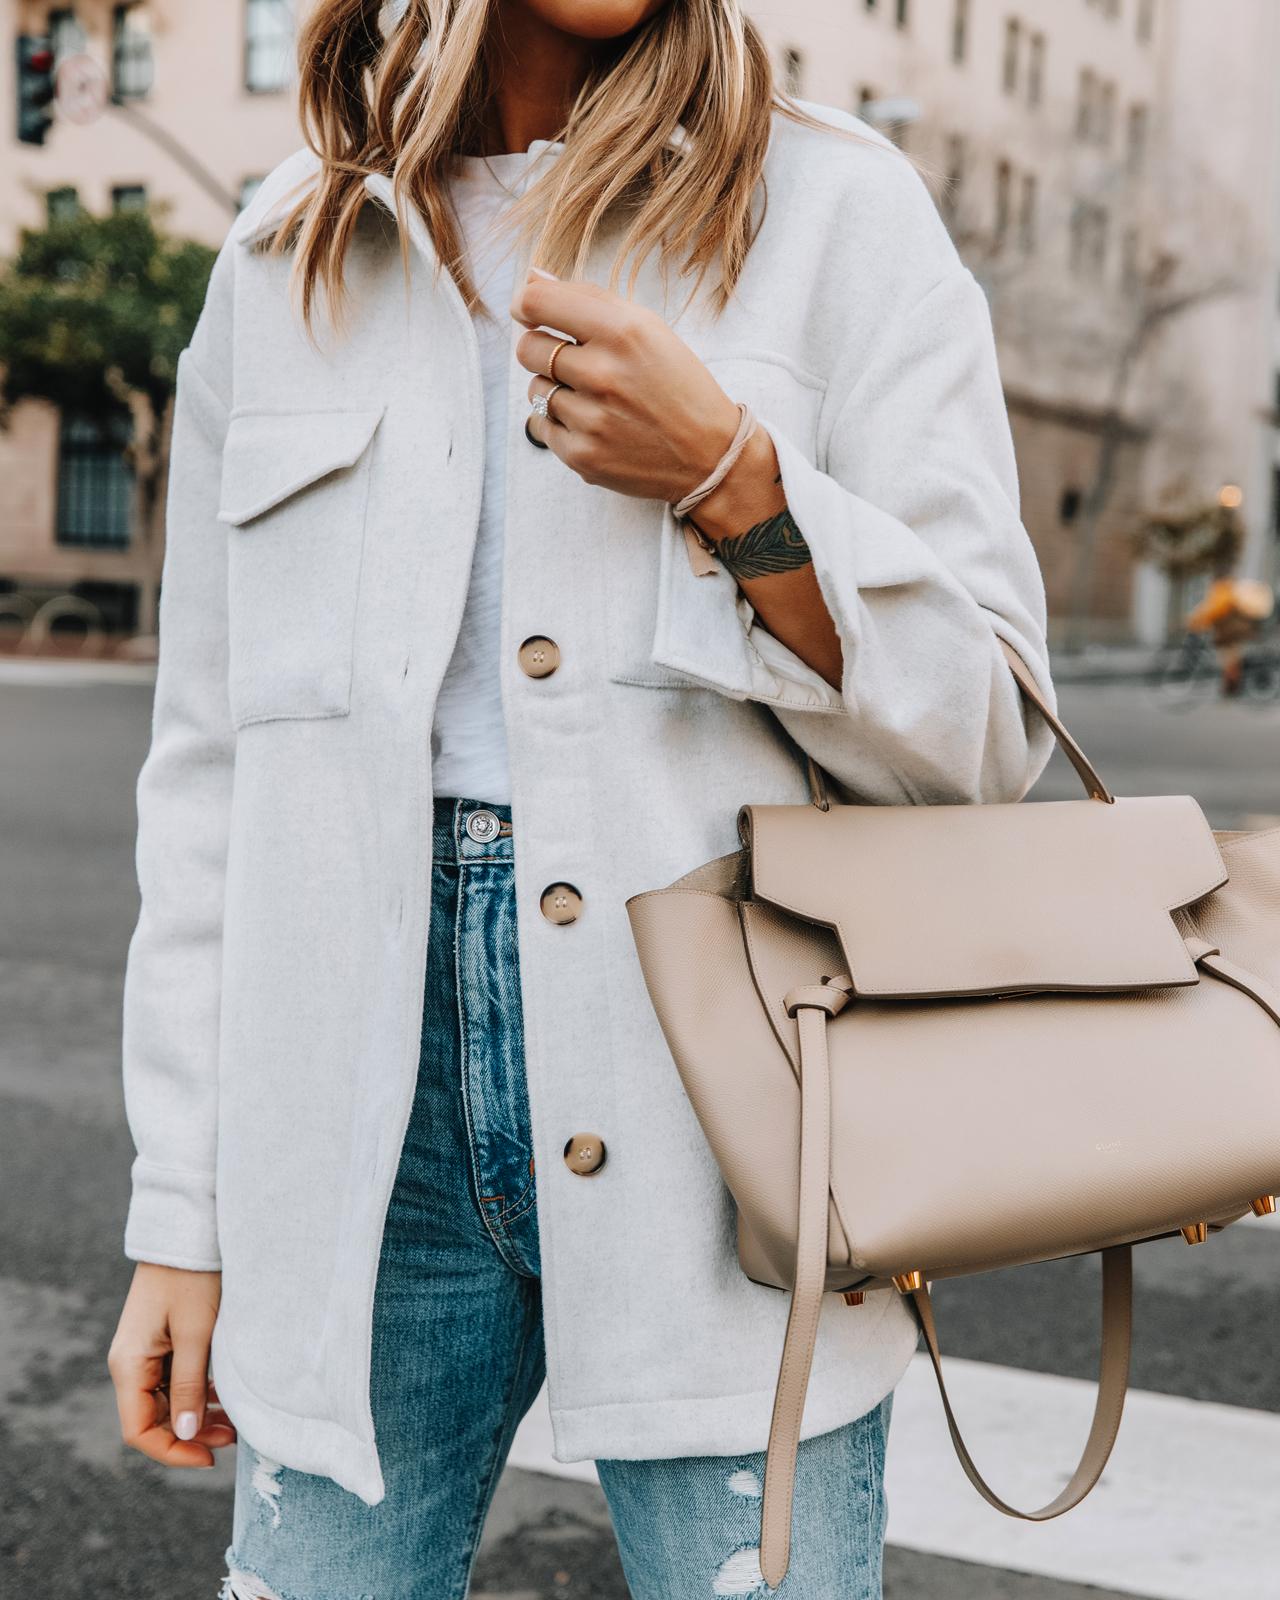 Fashion Jackson Wearing Beige Shacket White Tshirt Ripped Jeans Celine Belt Bag